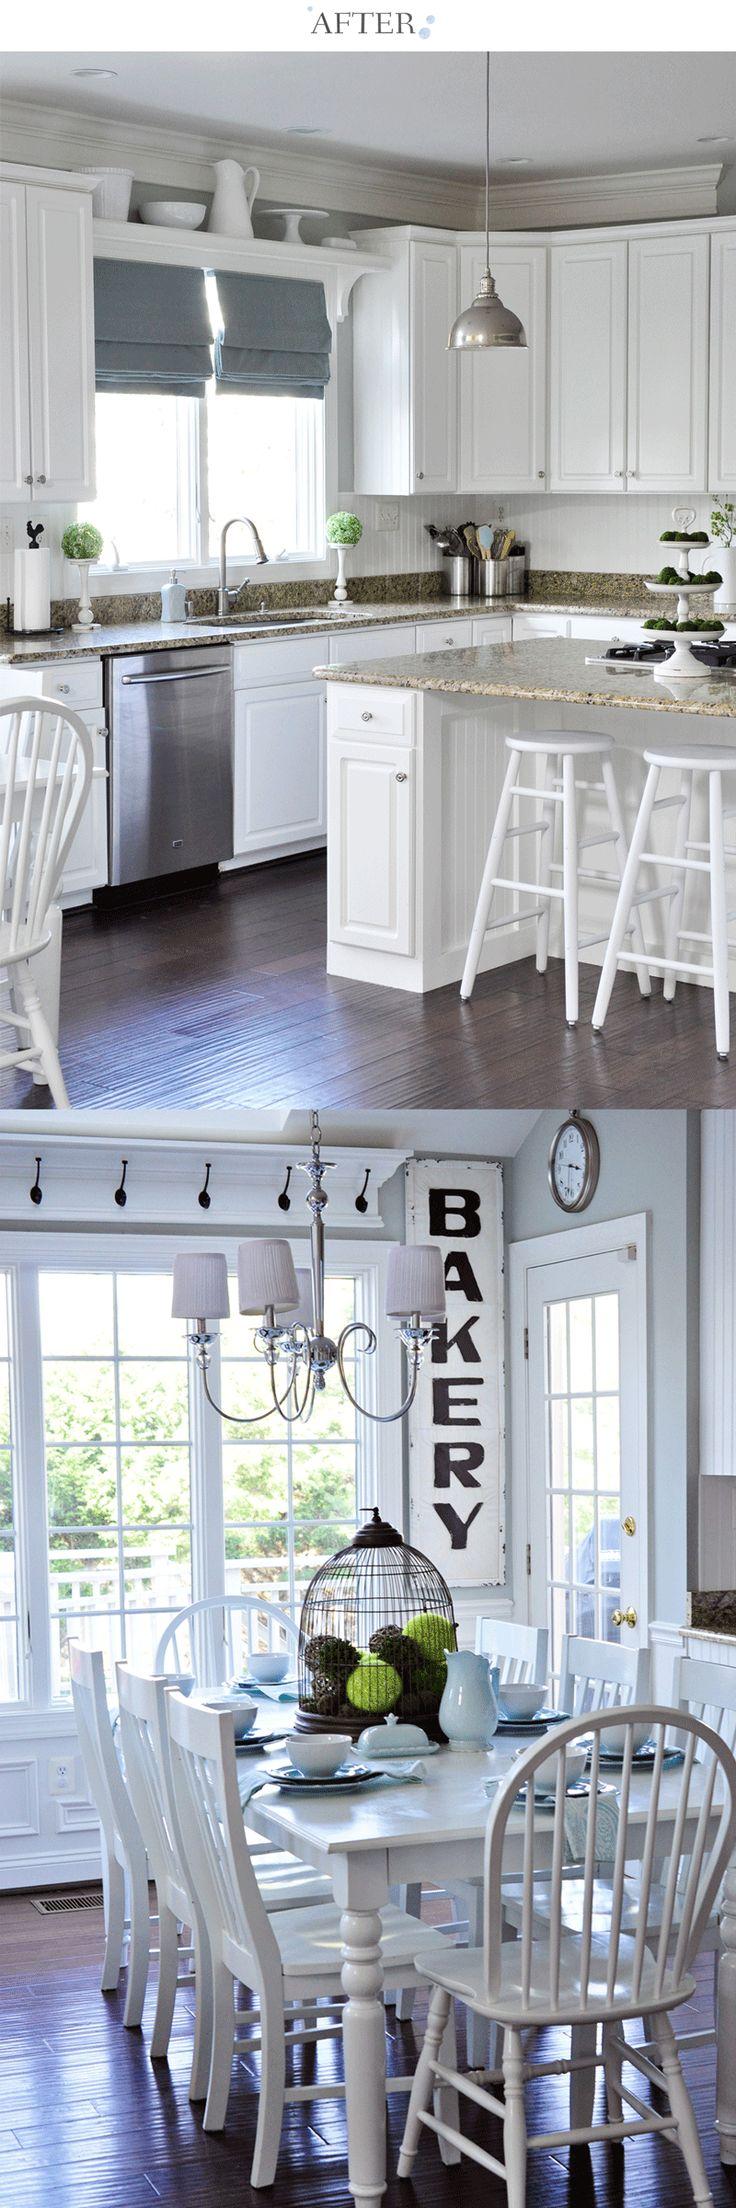 25+ best ideas about Shelves over kitchen sink on Pinterest